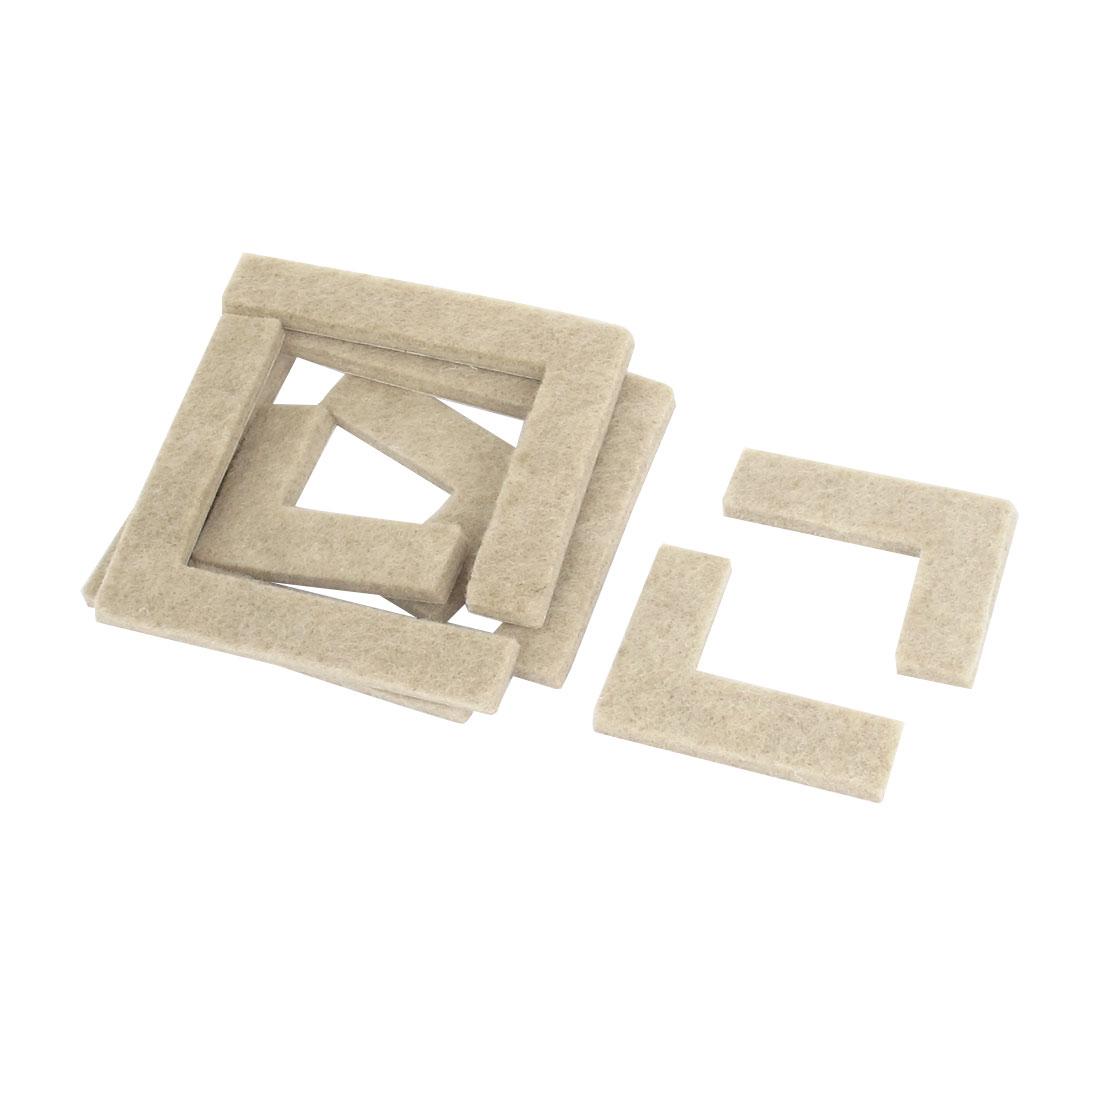 Home Kitchen Furniture Adhesive Stick Felt Corner Pads Khaki 8pcs